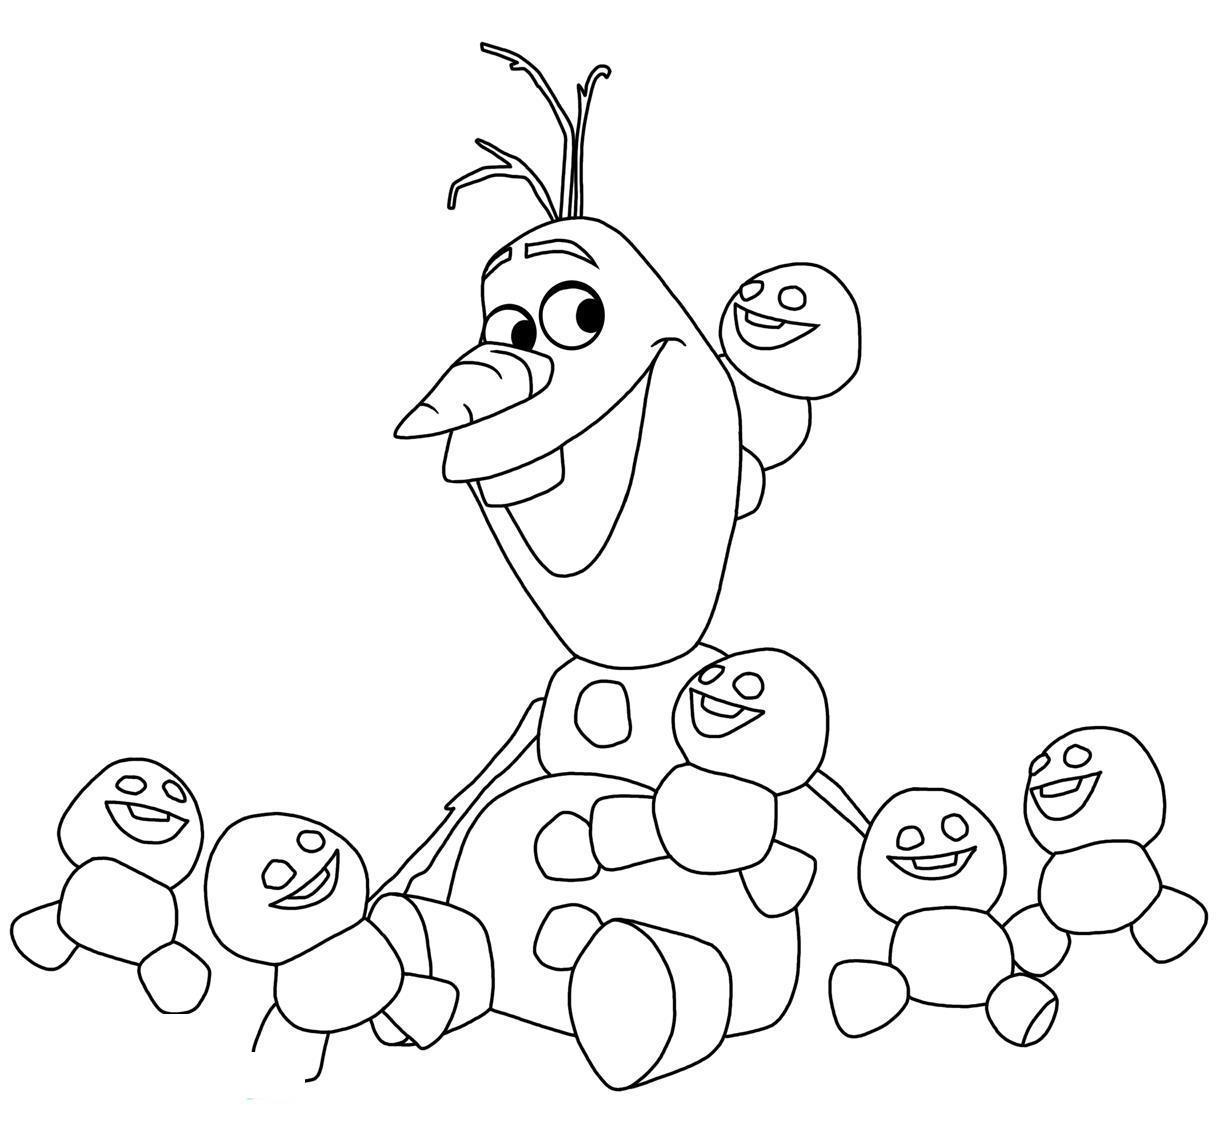 Снеговик олаф со снеговичатами Раскраска зима пришла